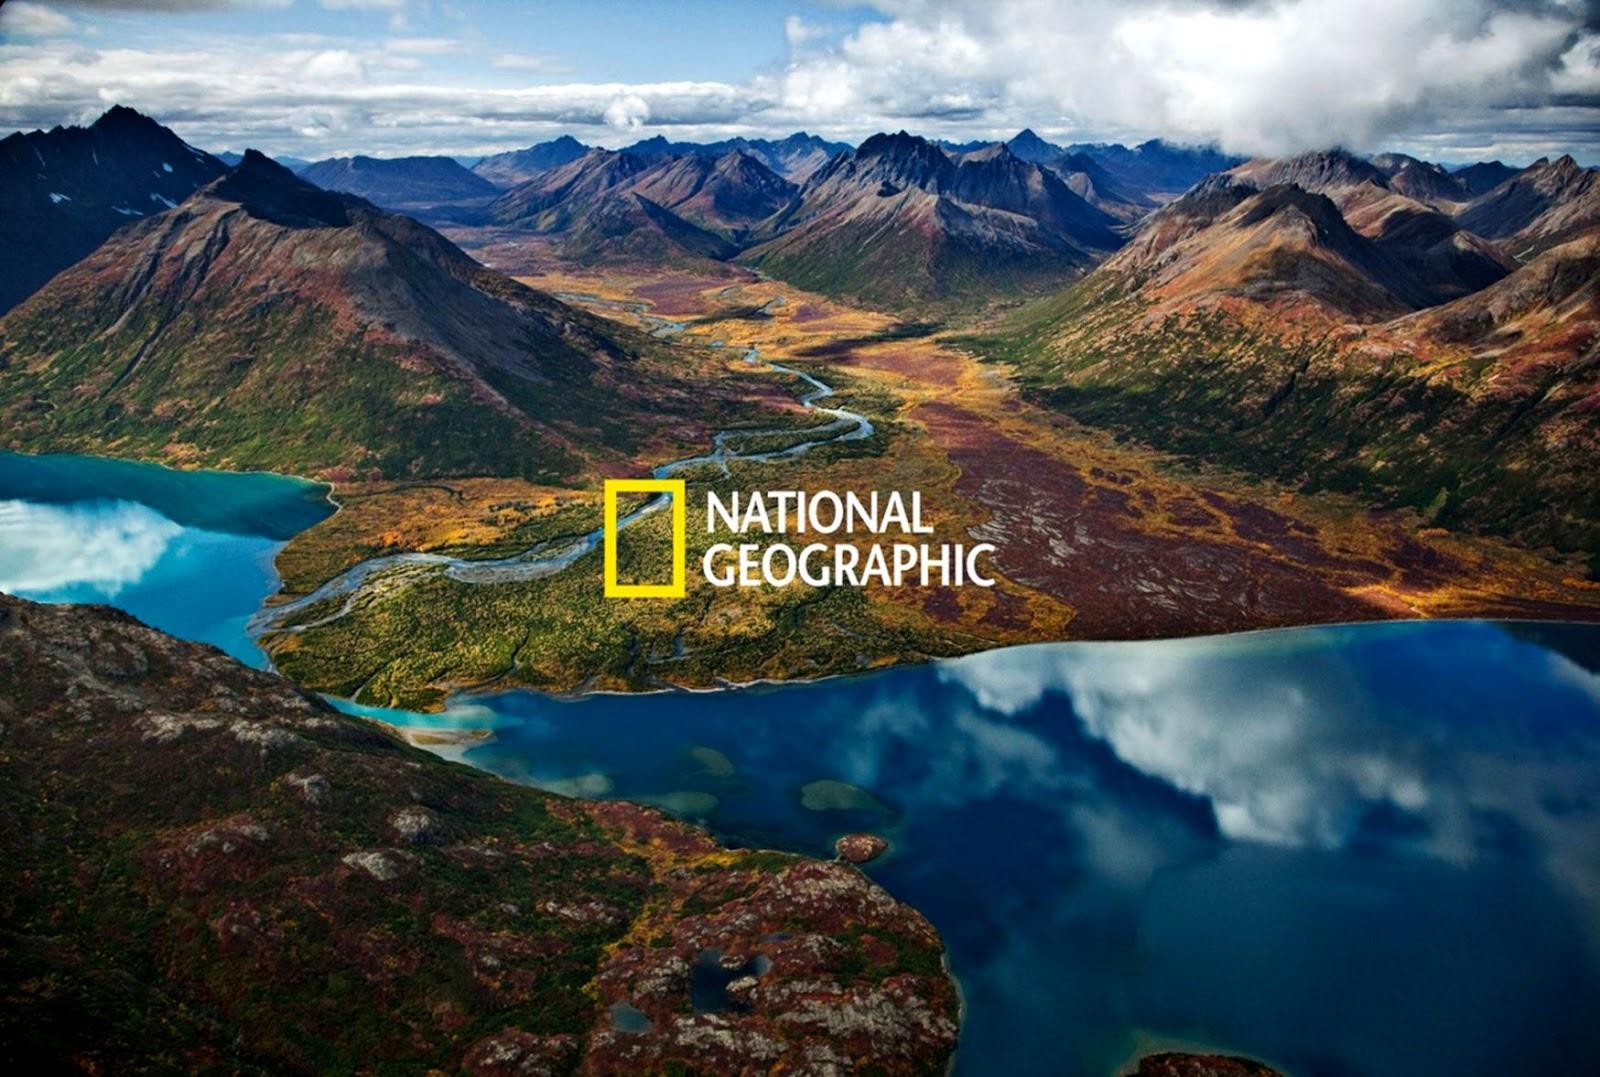 National Geographic Logo Hd Wallpaper Joss Wallpapers